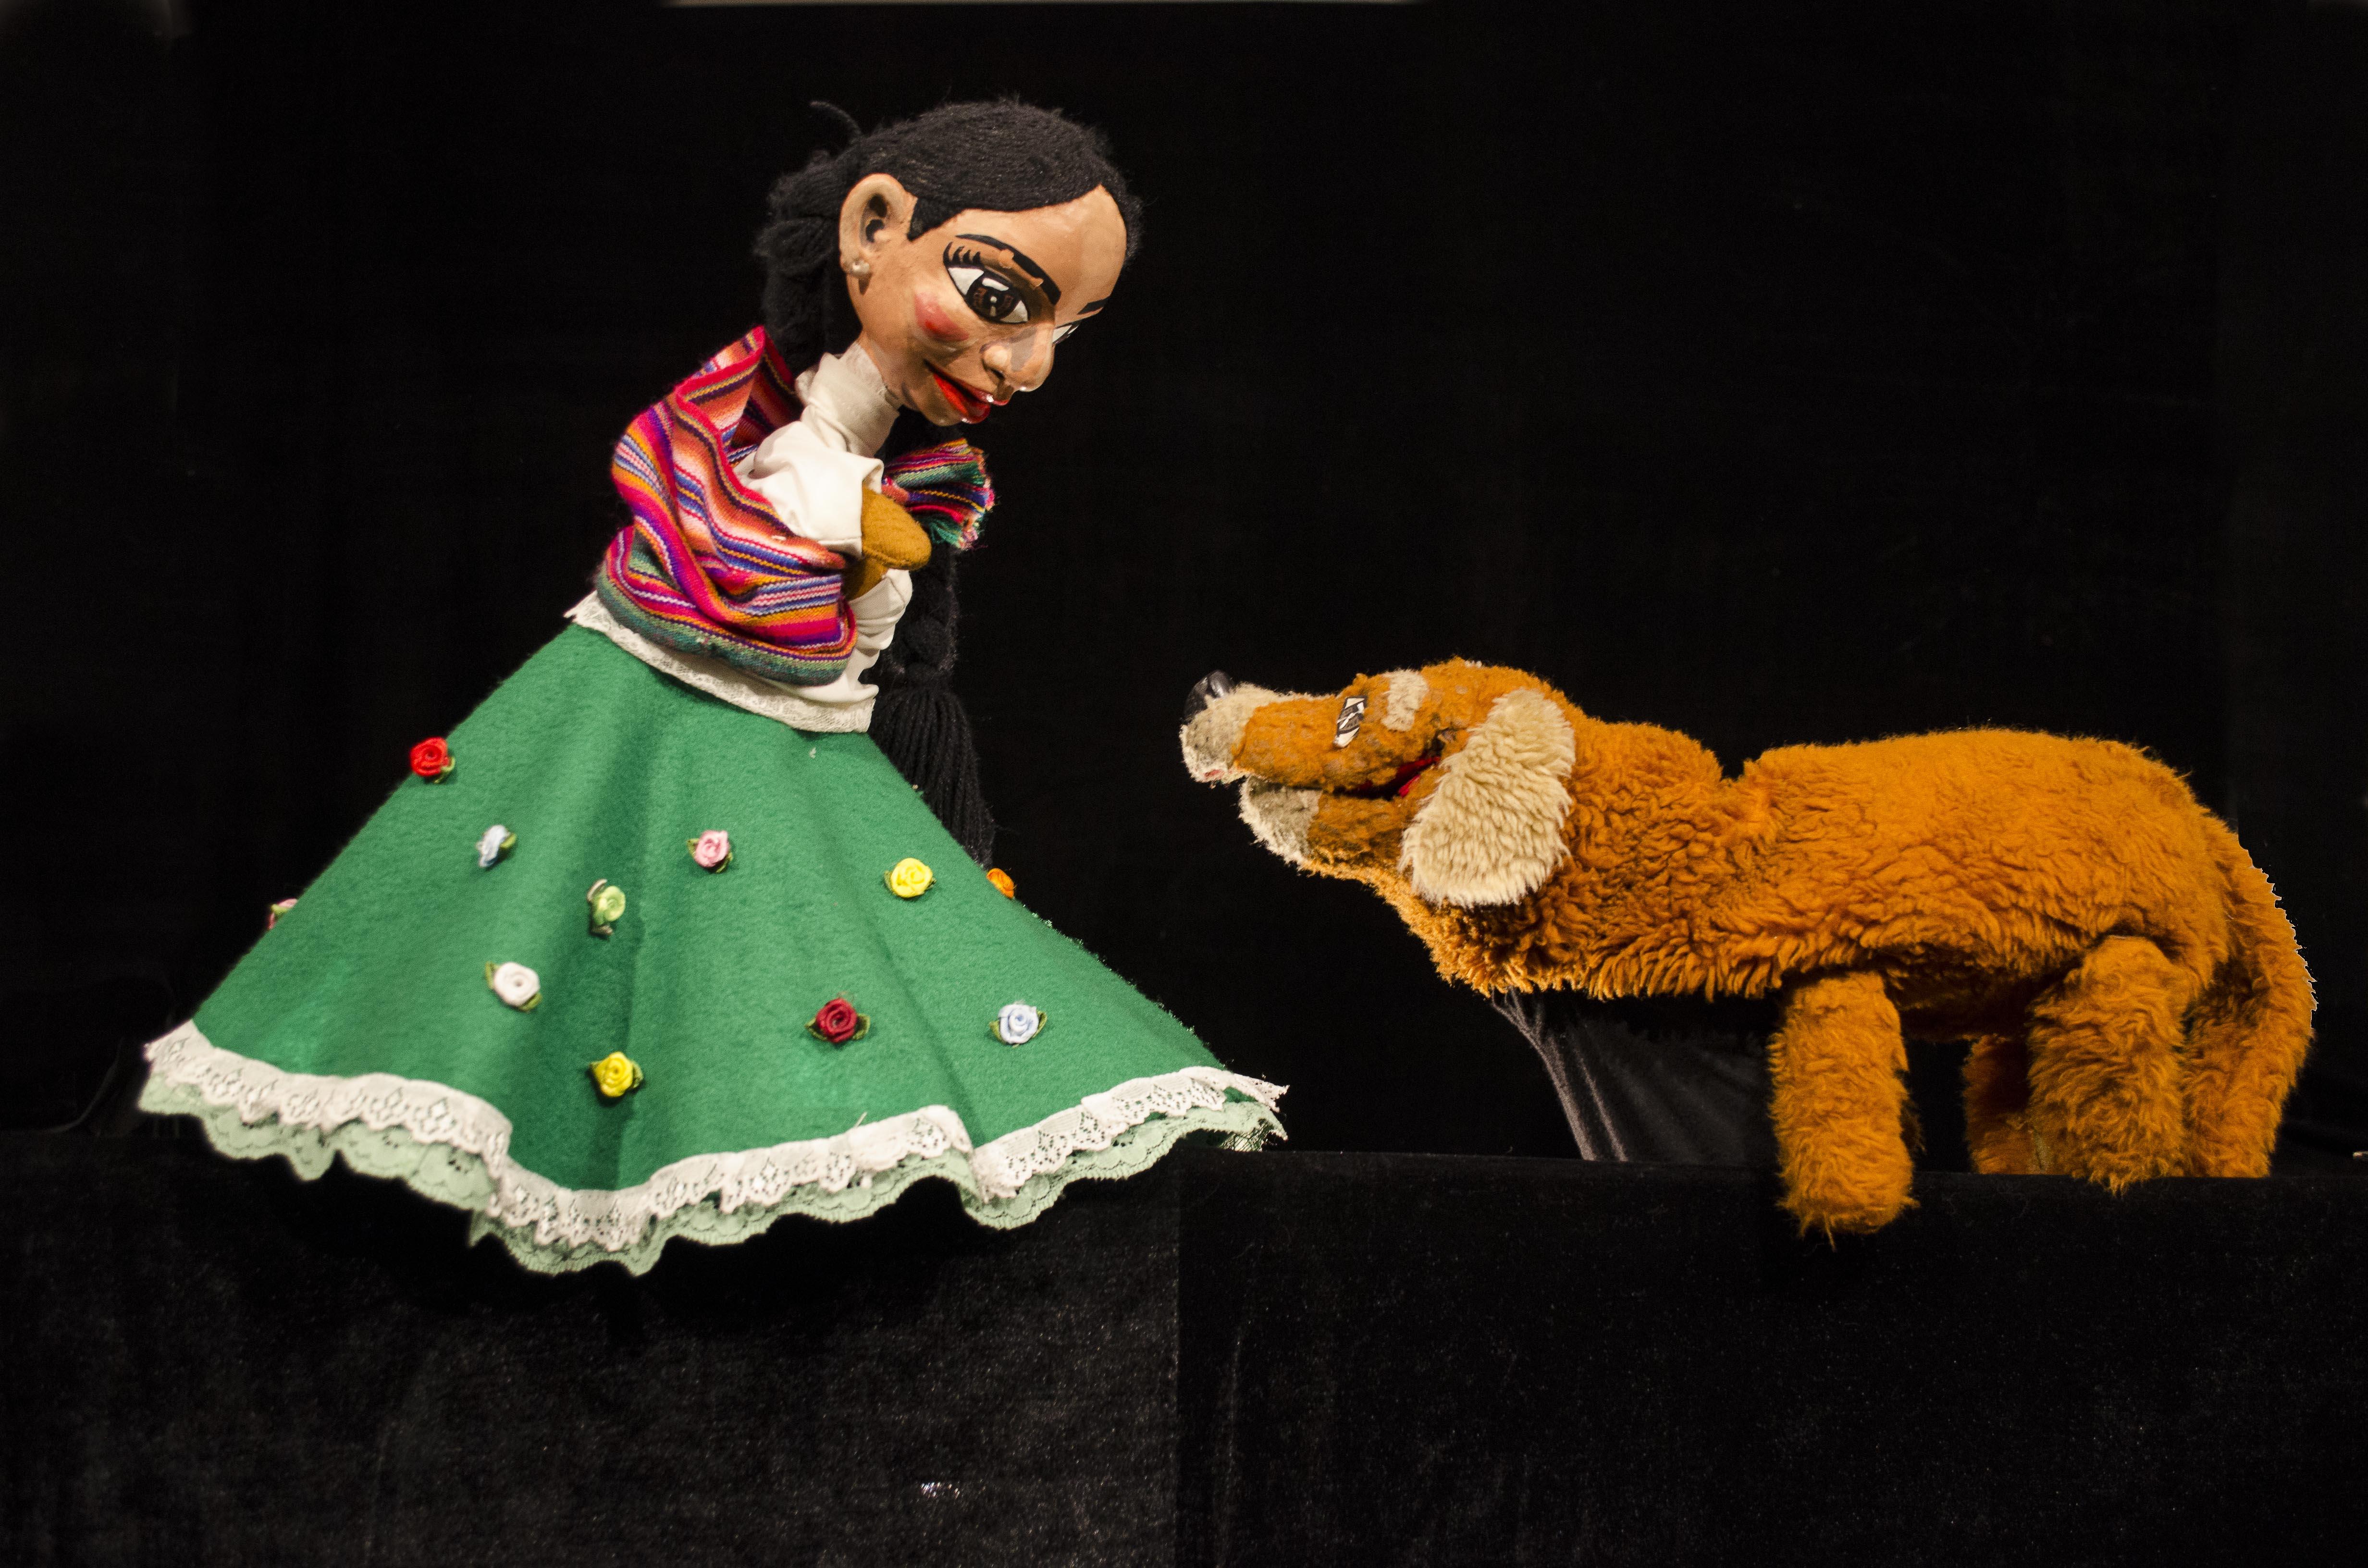 Juancha y Mariacha6